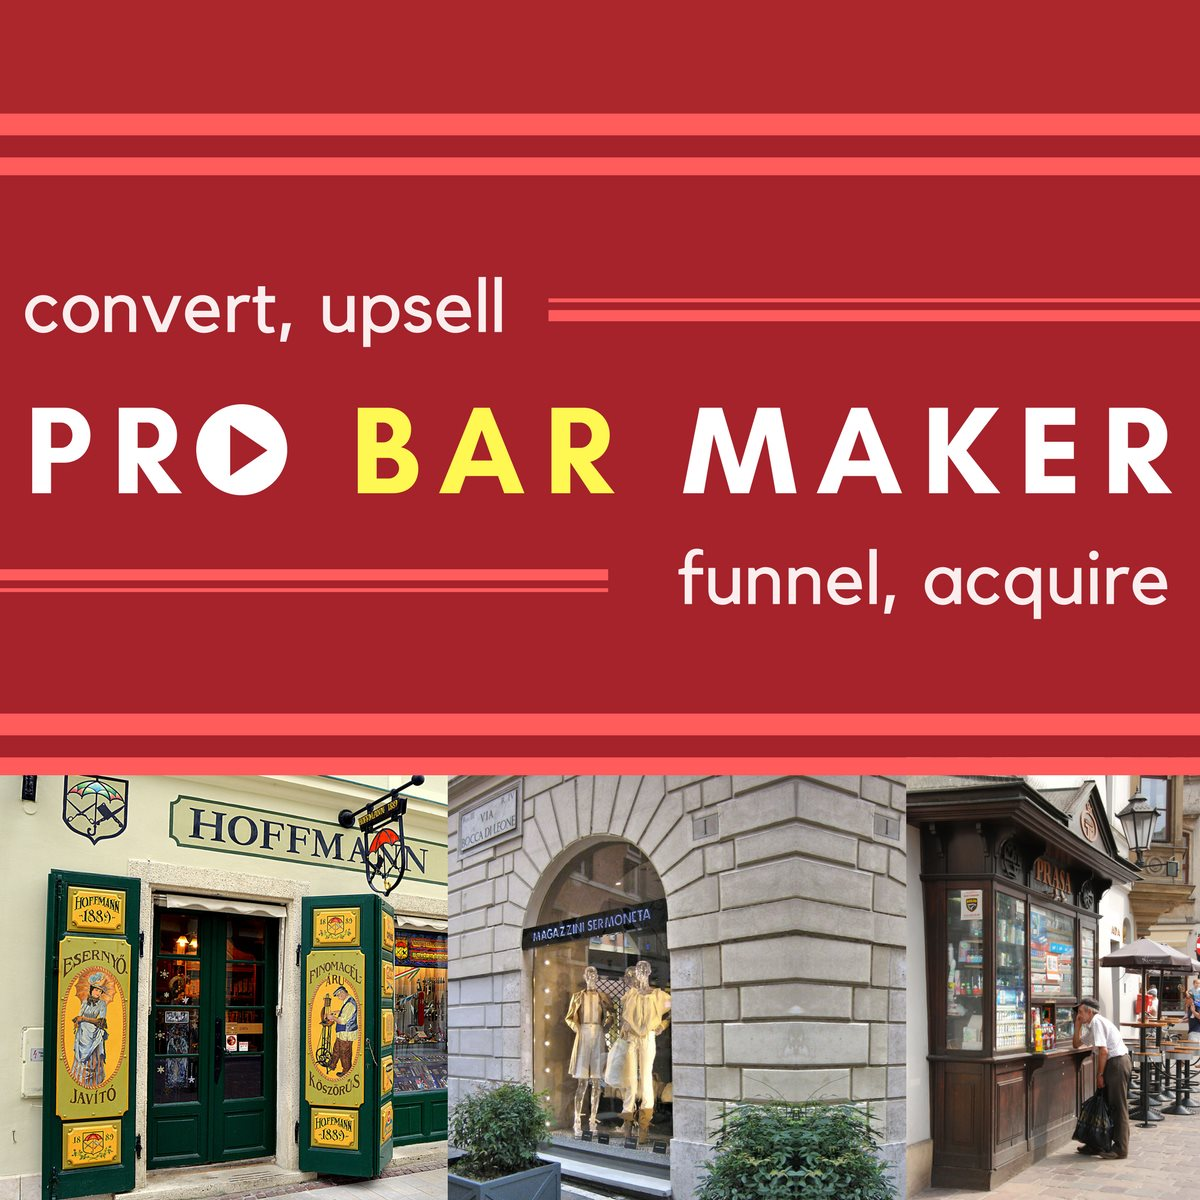 Pro Bar Maker - Shopify App